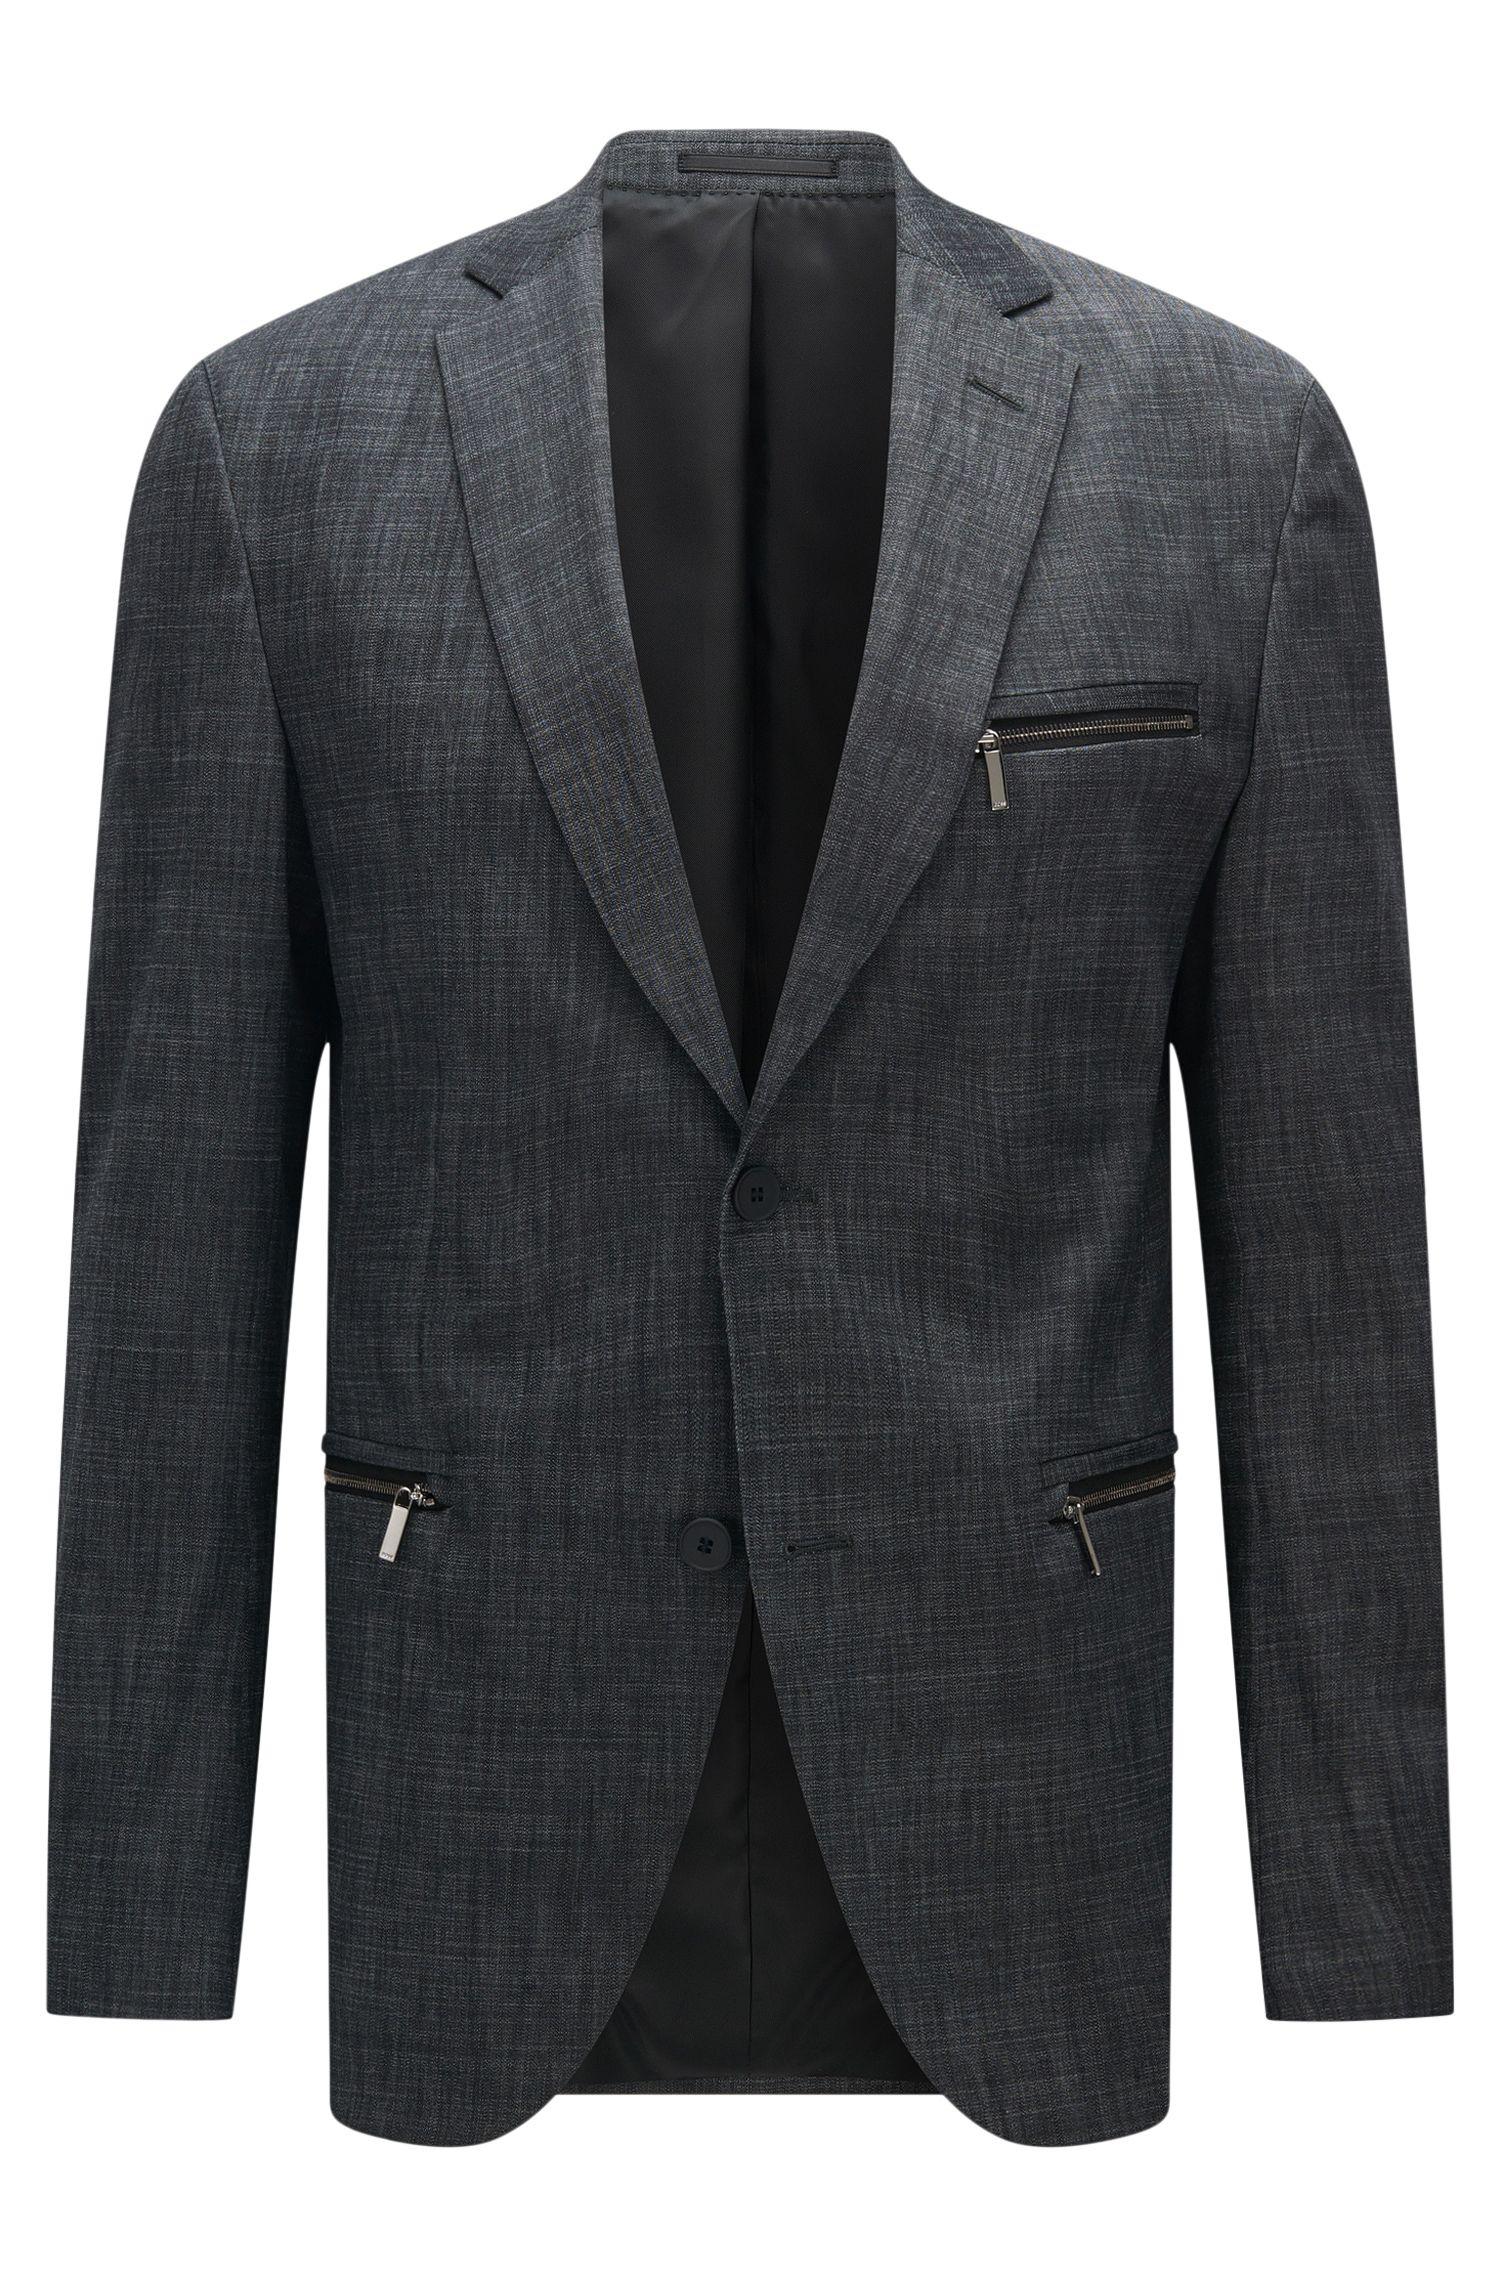 'Ronen' | Extra Slim Fit, Stretch Cotton Blend Patterned Blazer